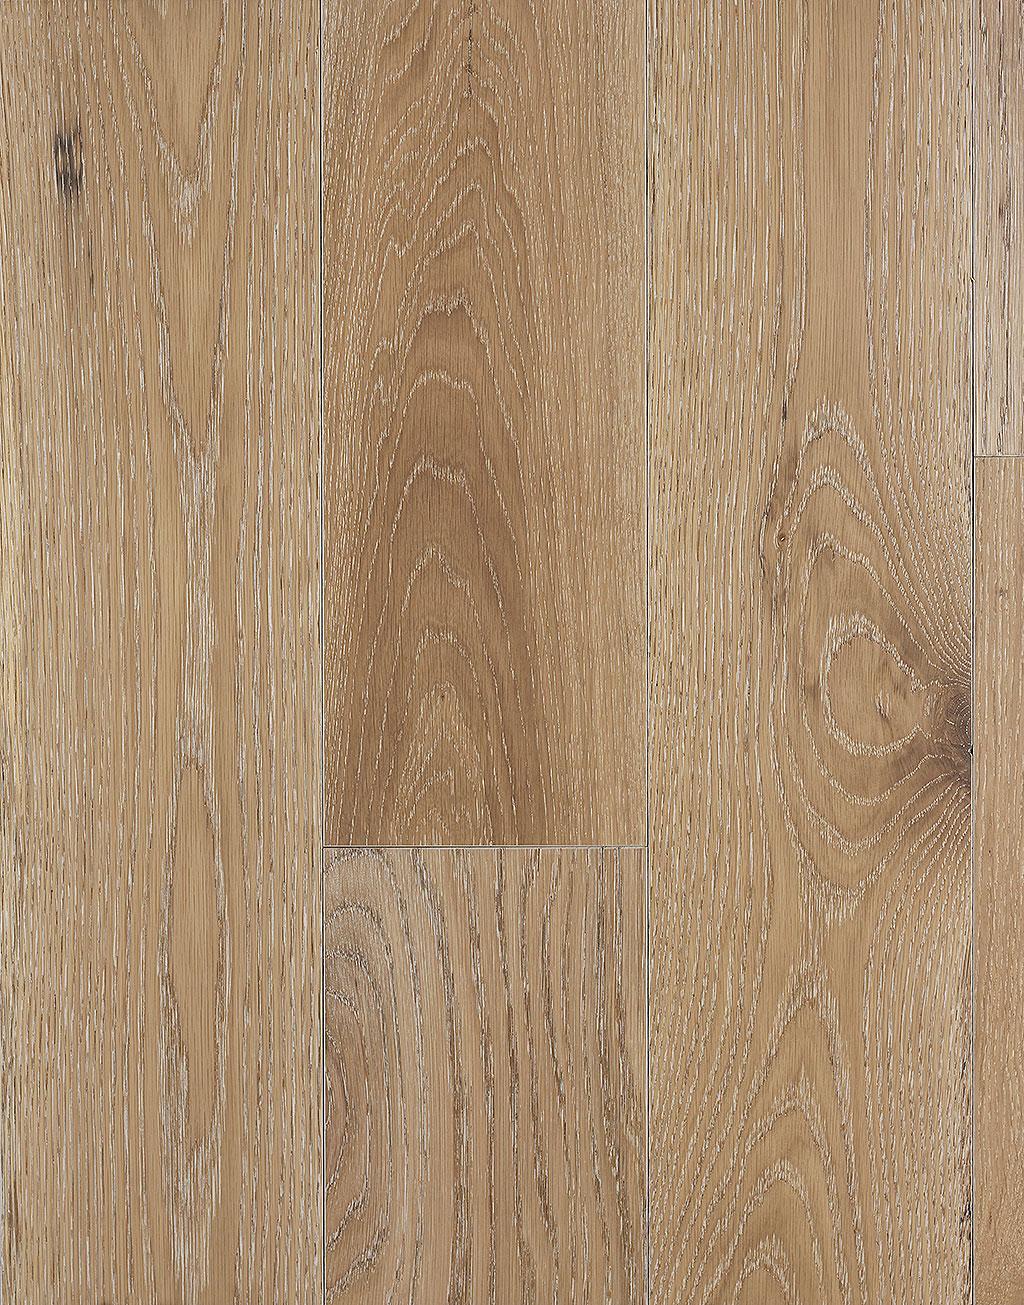 Hardwood Naturally Aged Flooring Medallion Collection